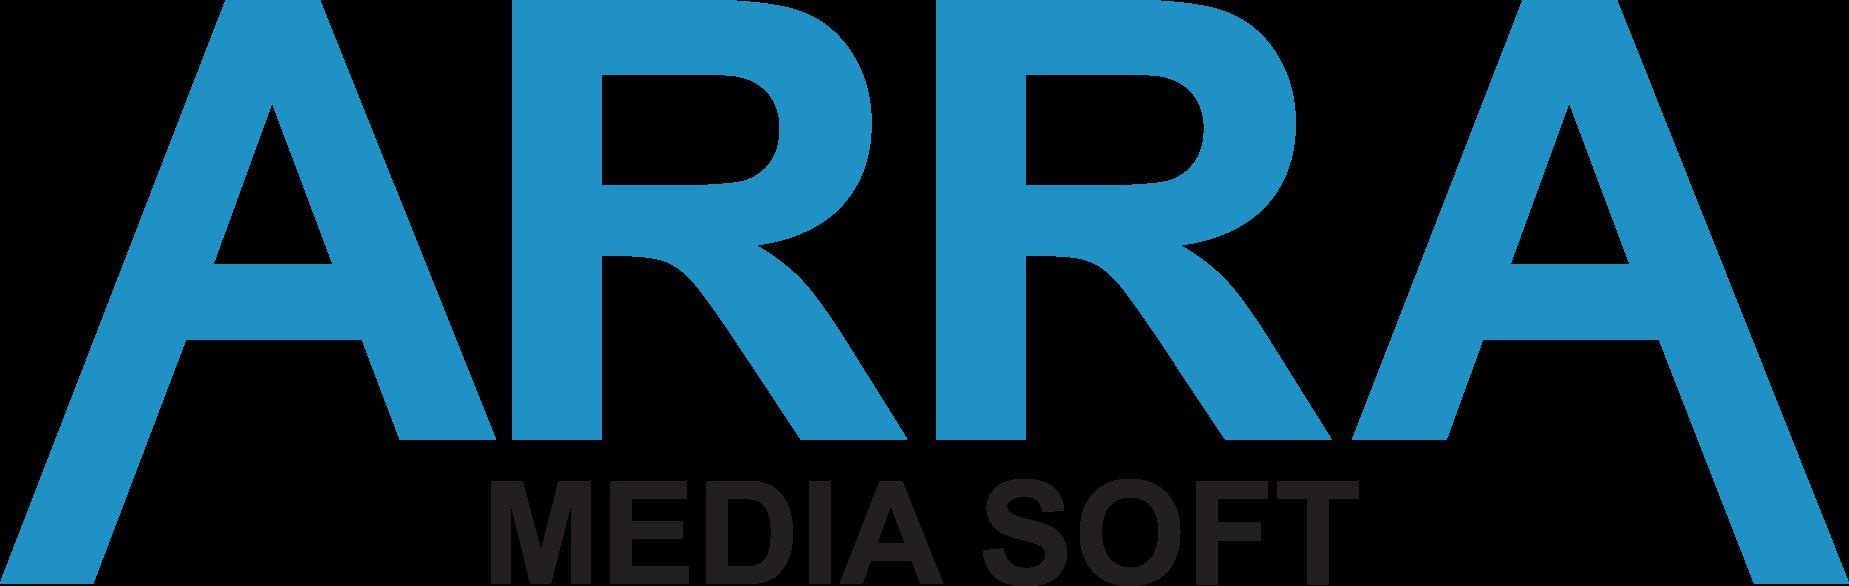 Media ARRA Soft